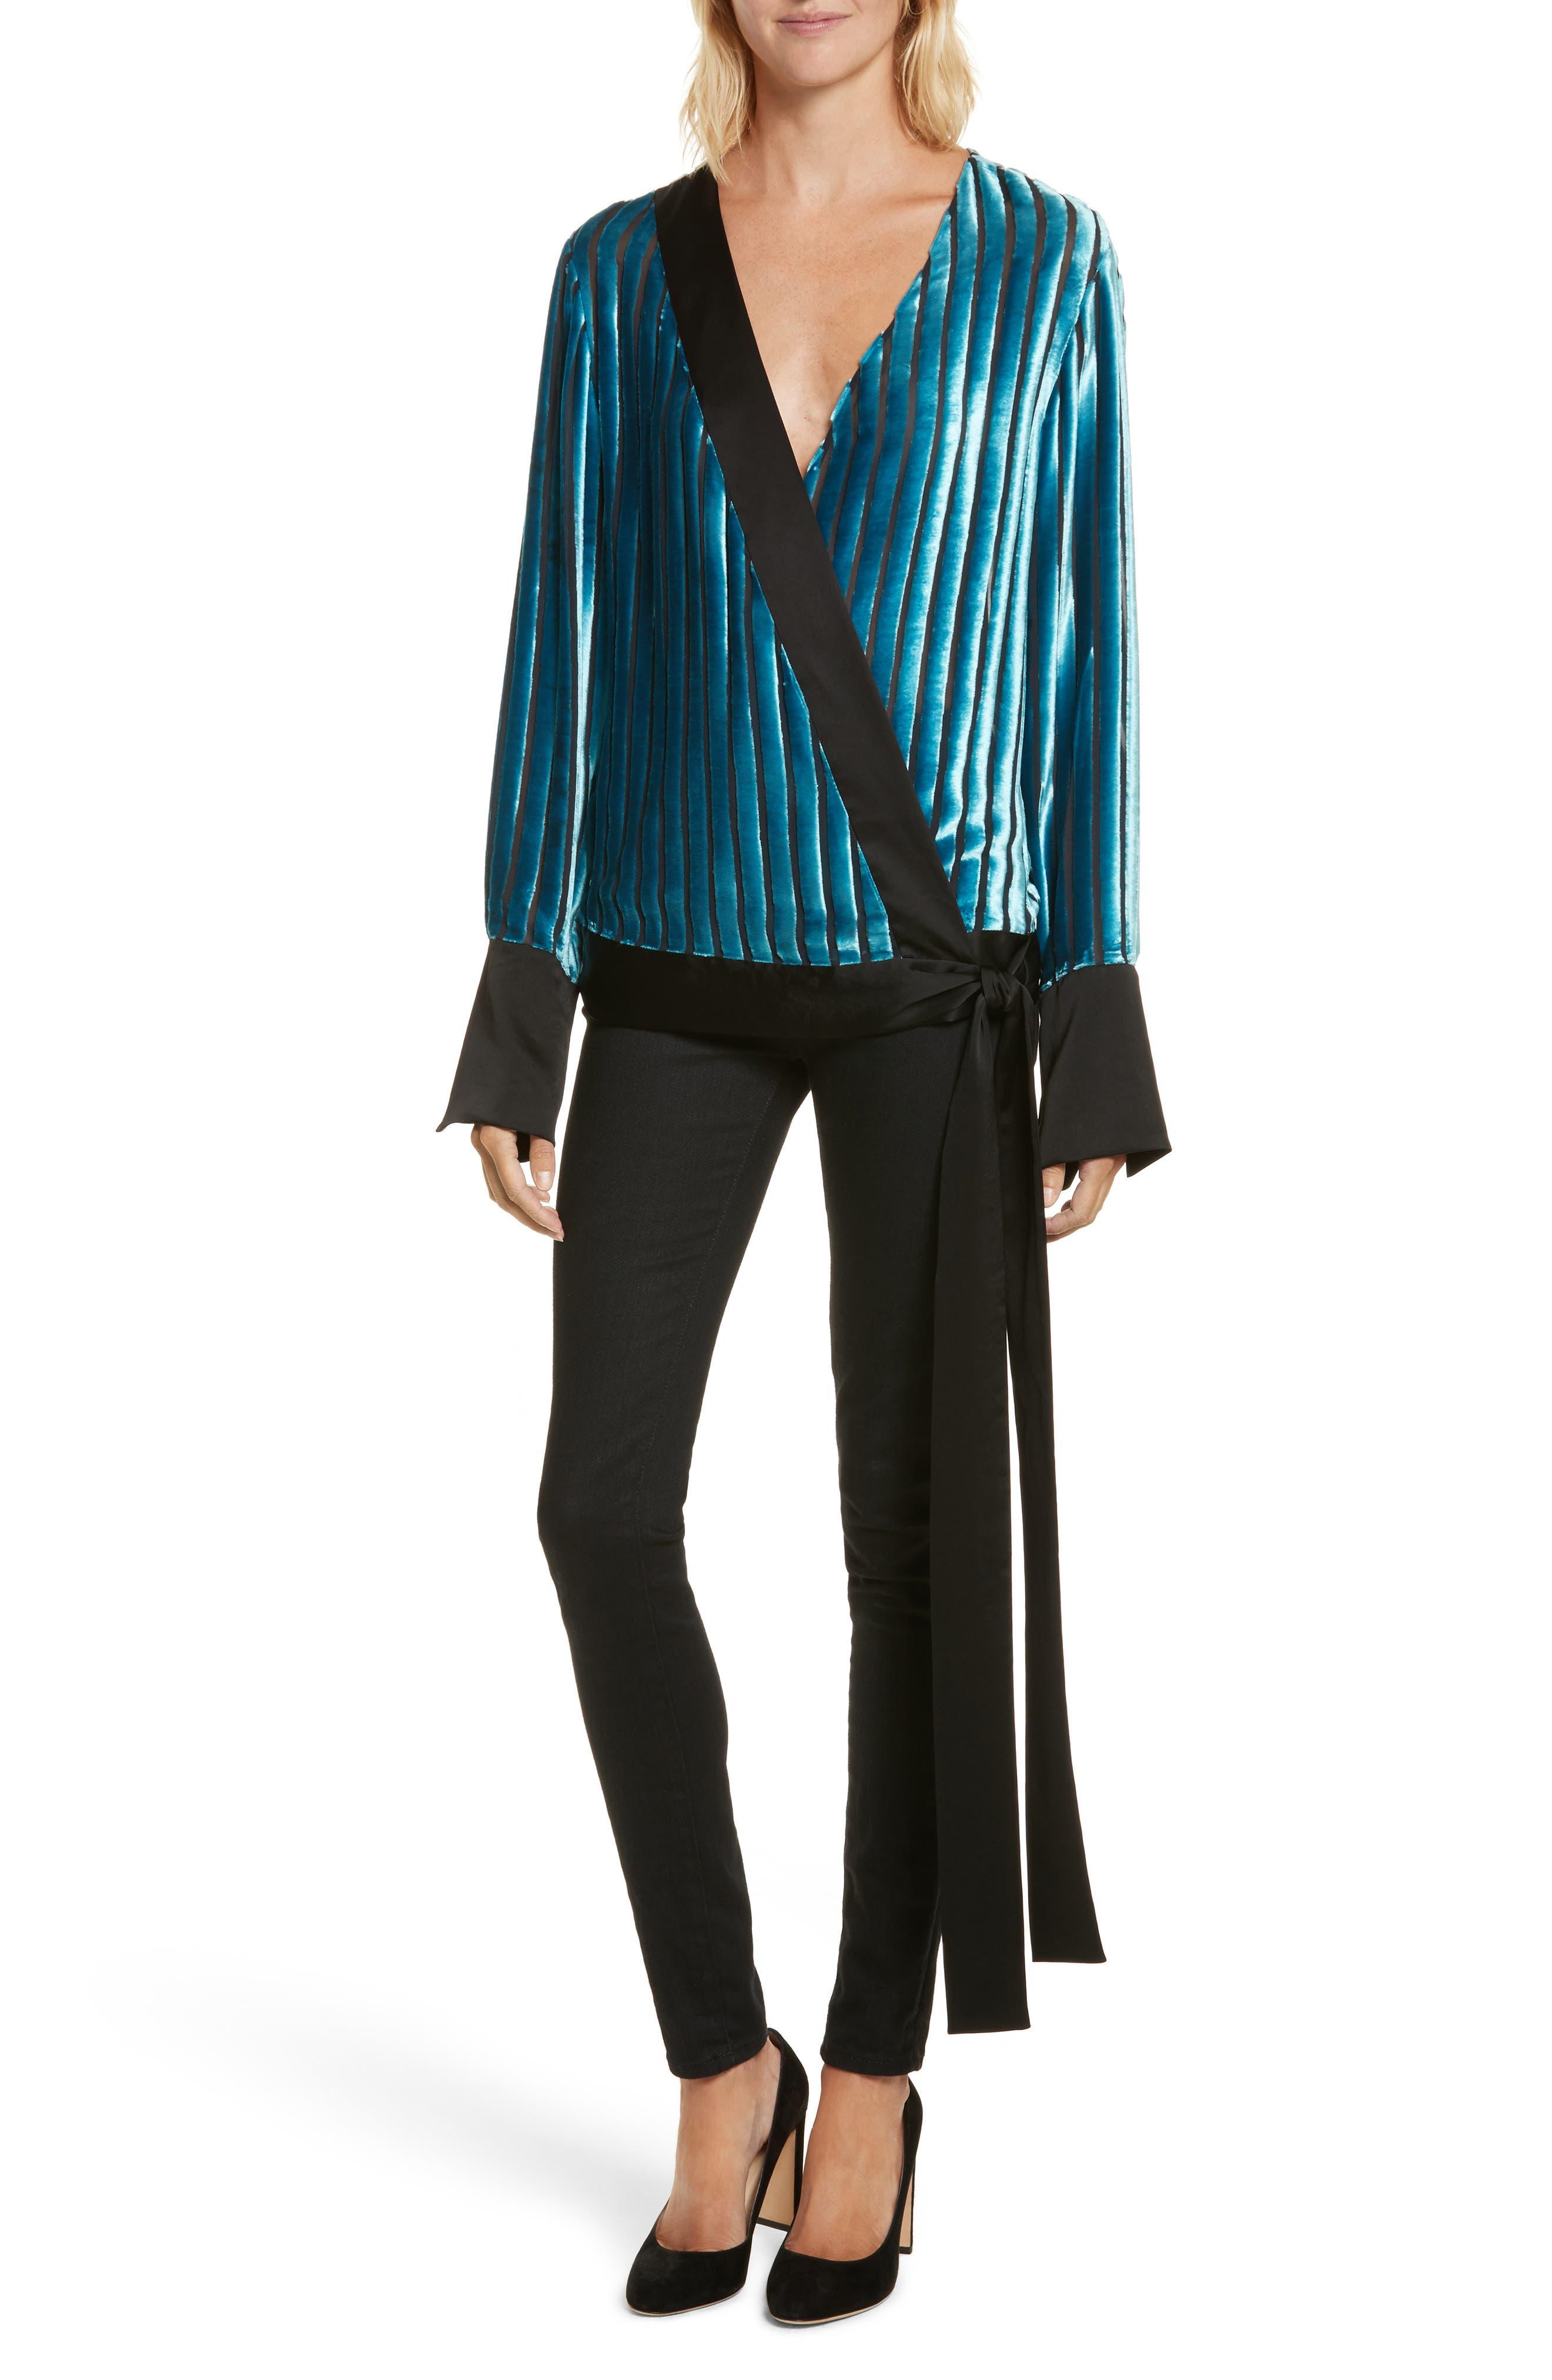 Diane von Furstenberg Velvet Stripe Blouse,                         Main,                         color, Black/ Marine